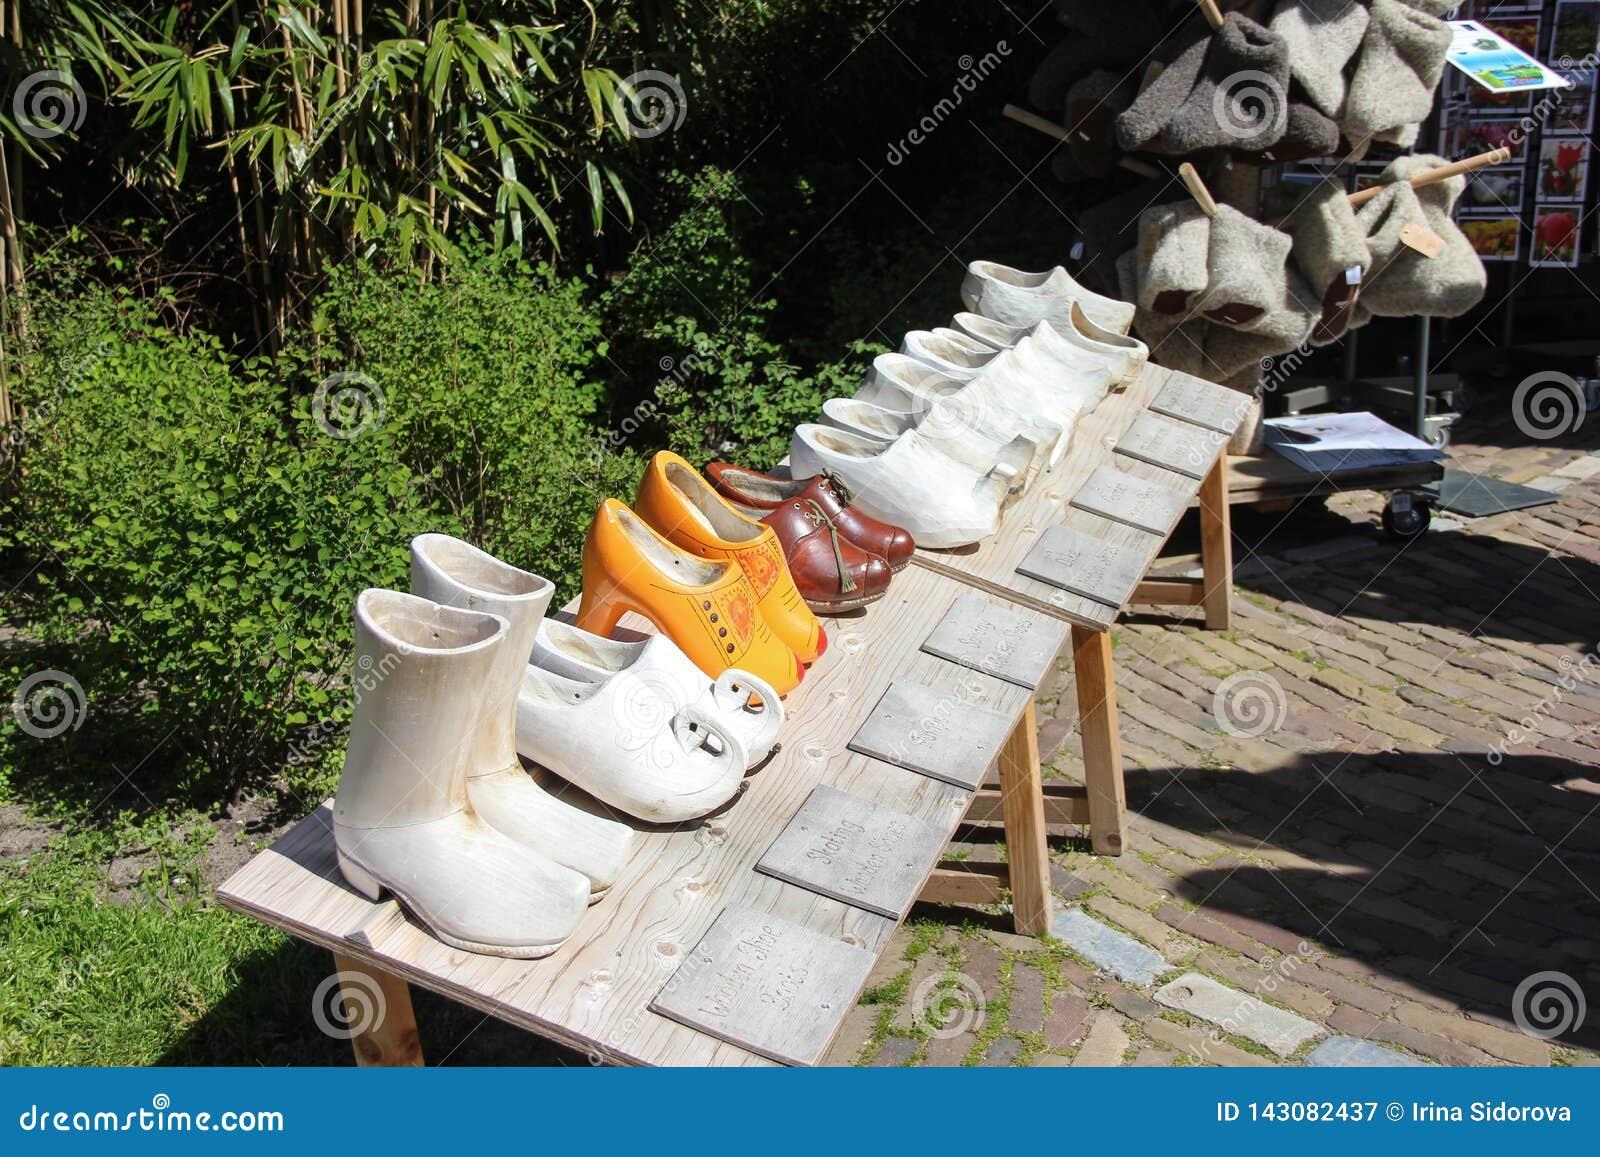 Klompen - Clog παραδοσιακά ξύλινα παιχνίδια αγαλμάτων παπουτσιών σε Lisse, Κάτω Χώρες, Ολλανδία Χρόνος άνοιξη στον κήπο Keukenhof